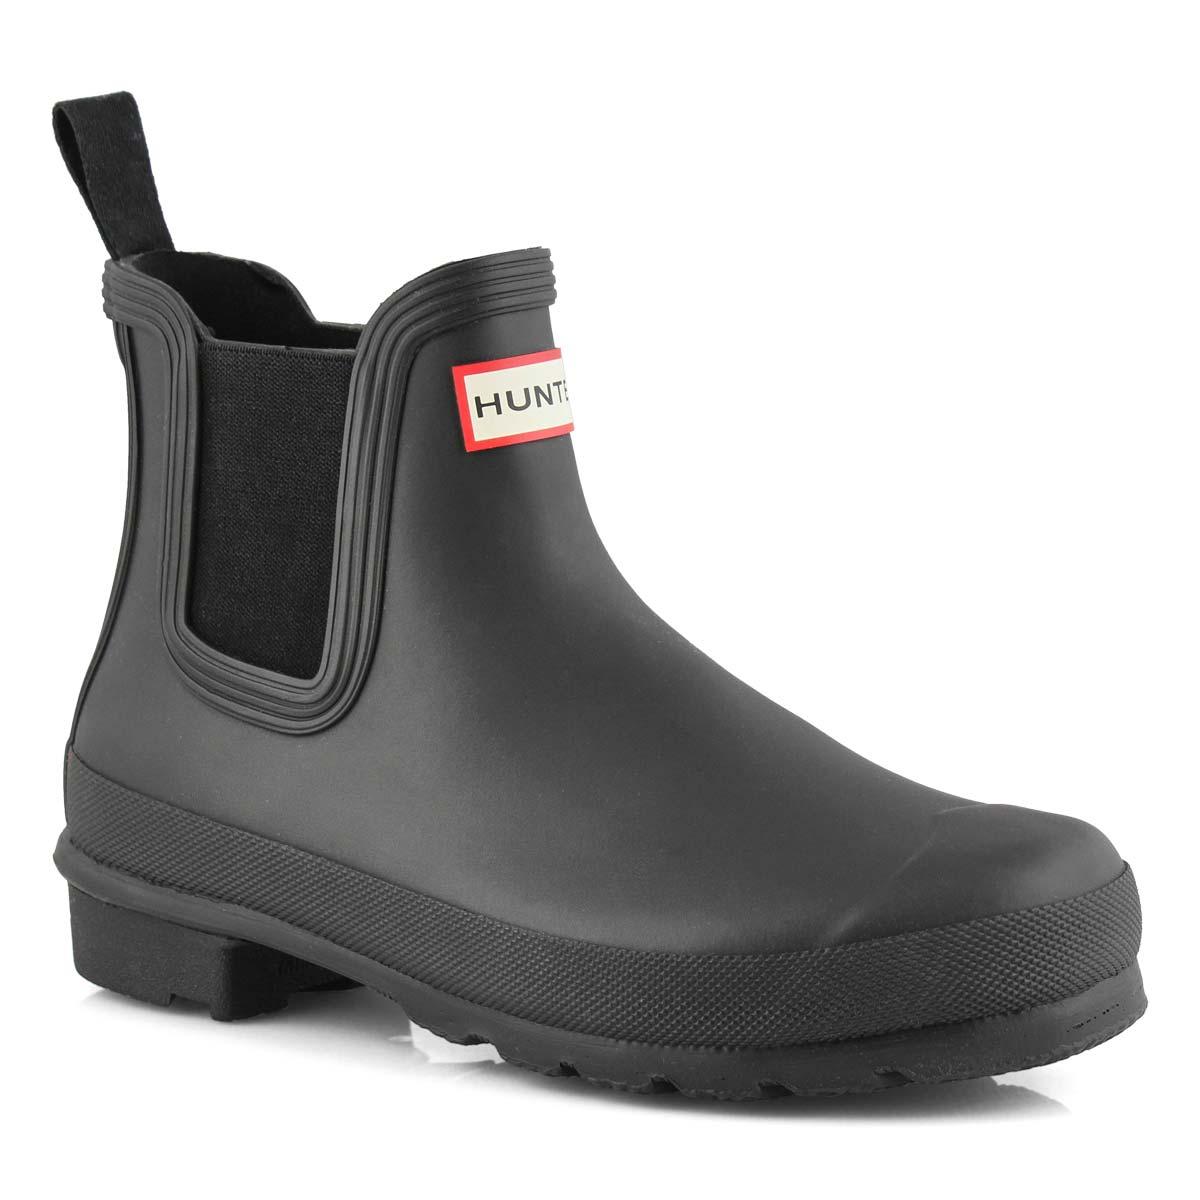 Lds Orig. Chelsea black rain boot